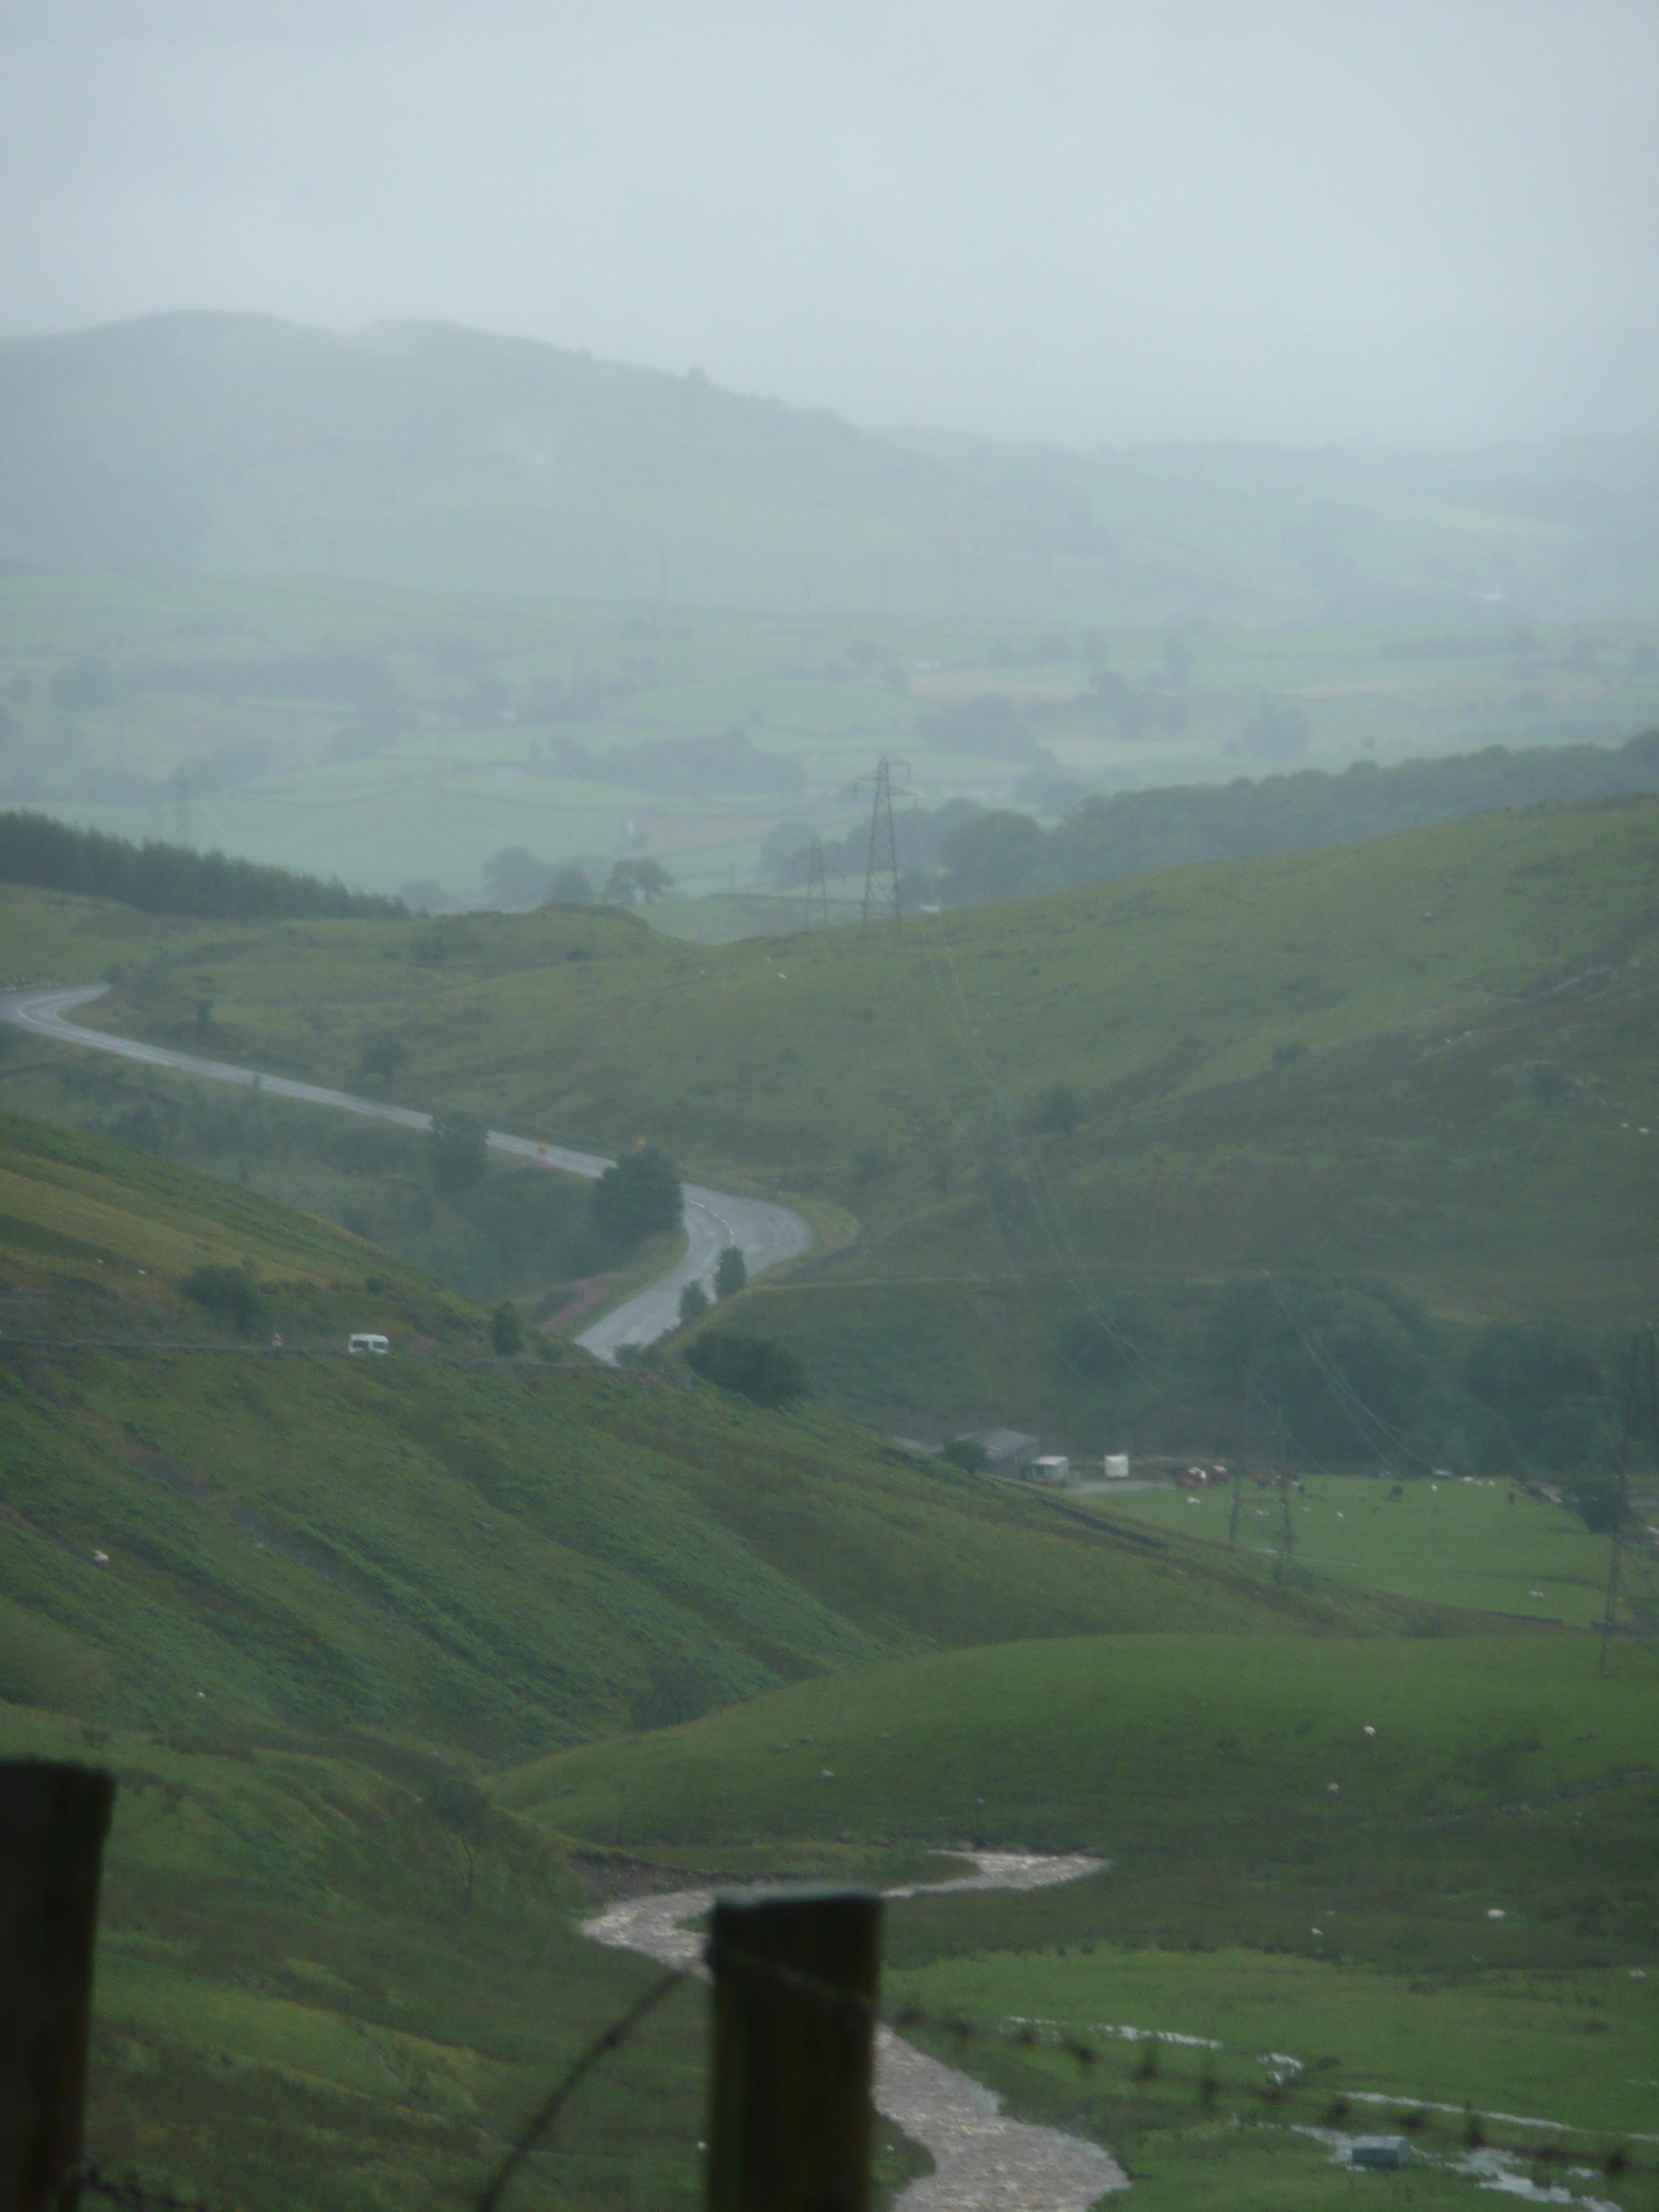 Cumbria: Landscape Impressions | Revealing Words